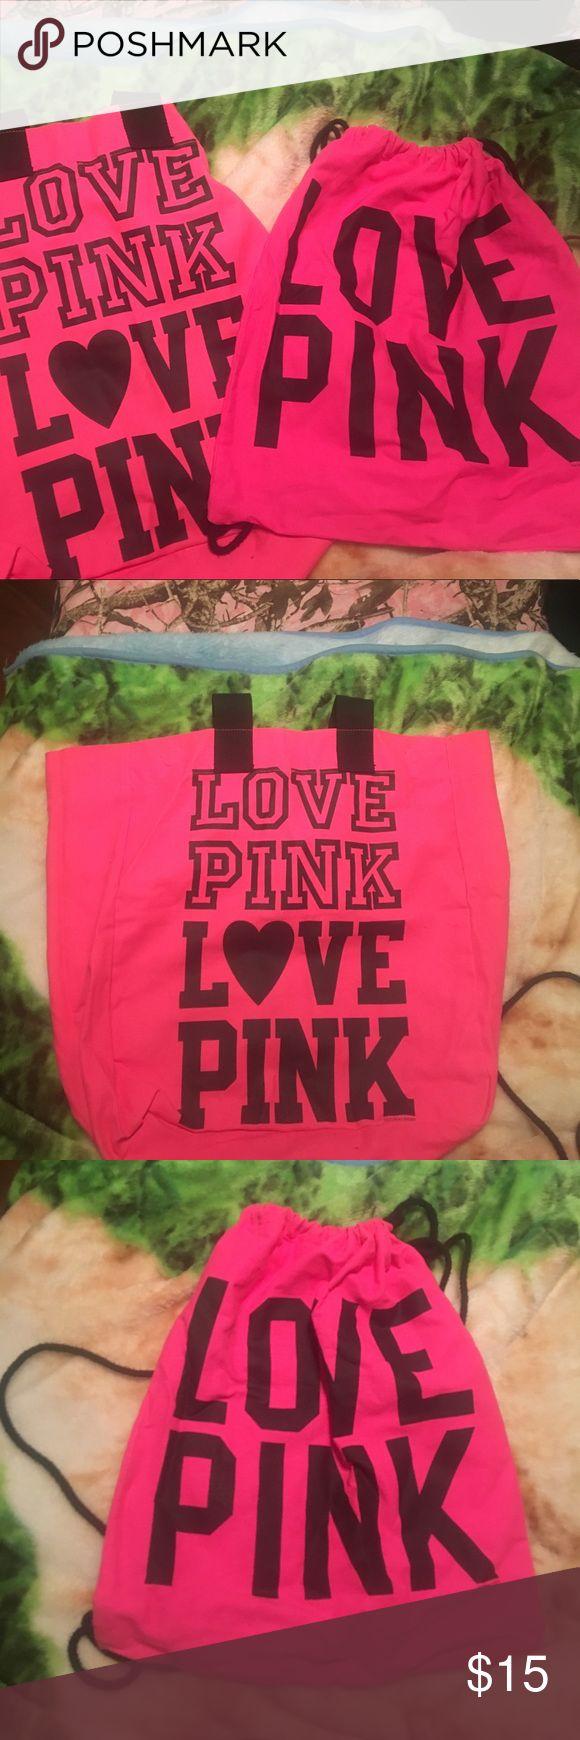 Pink tote bag and gym bag Victoria Secret Pink tote bag and matching gym bag PINK Victoria's Secret Bags Totes